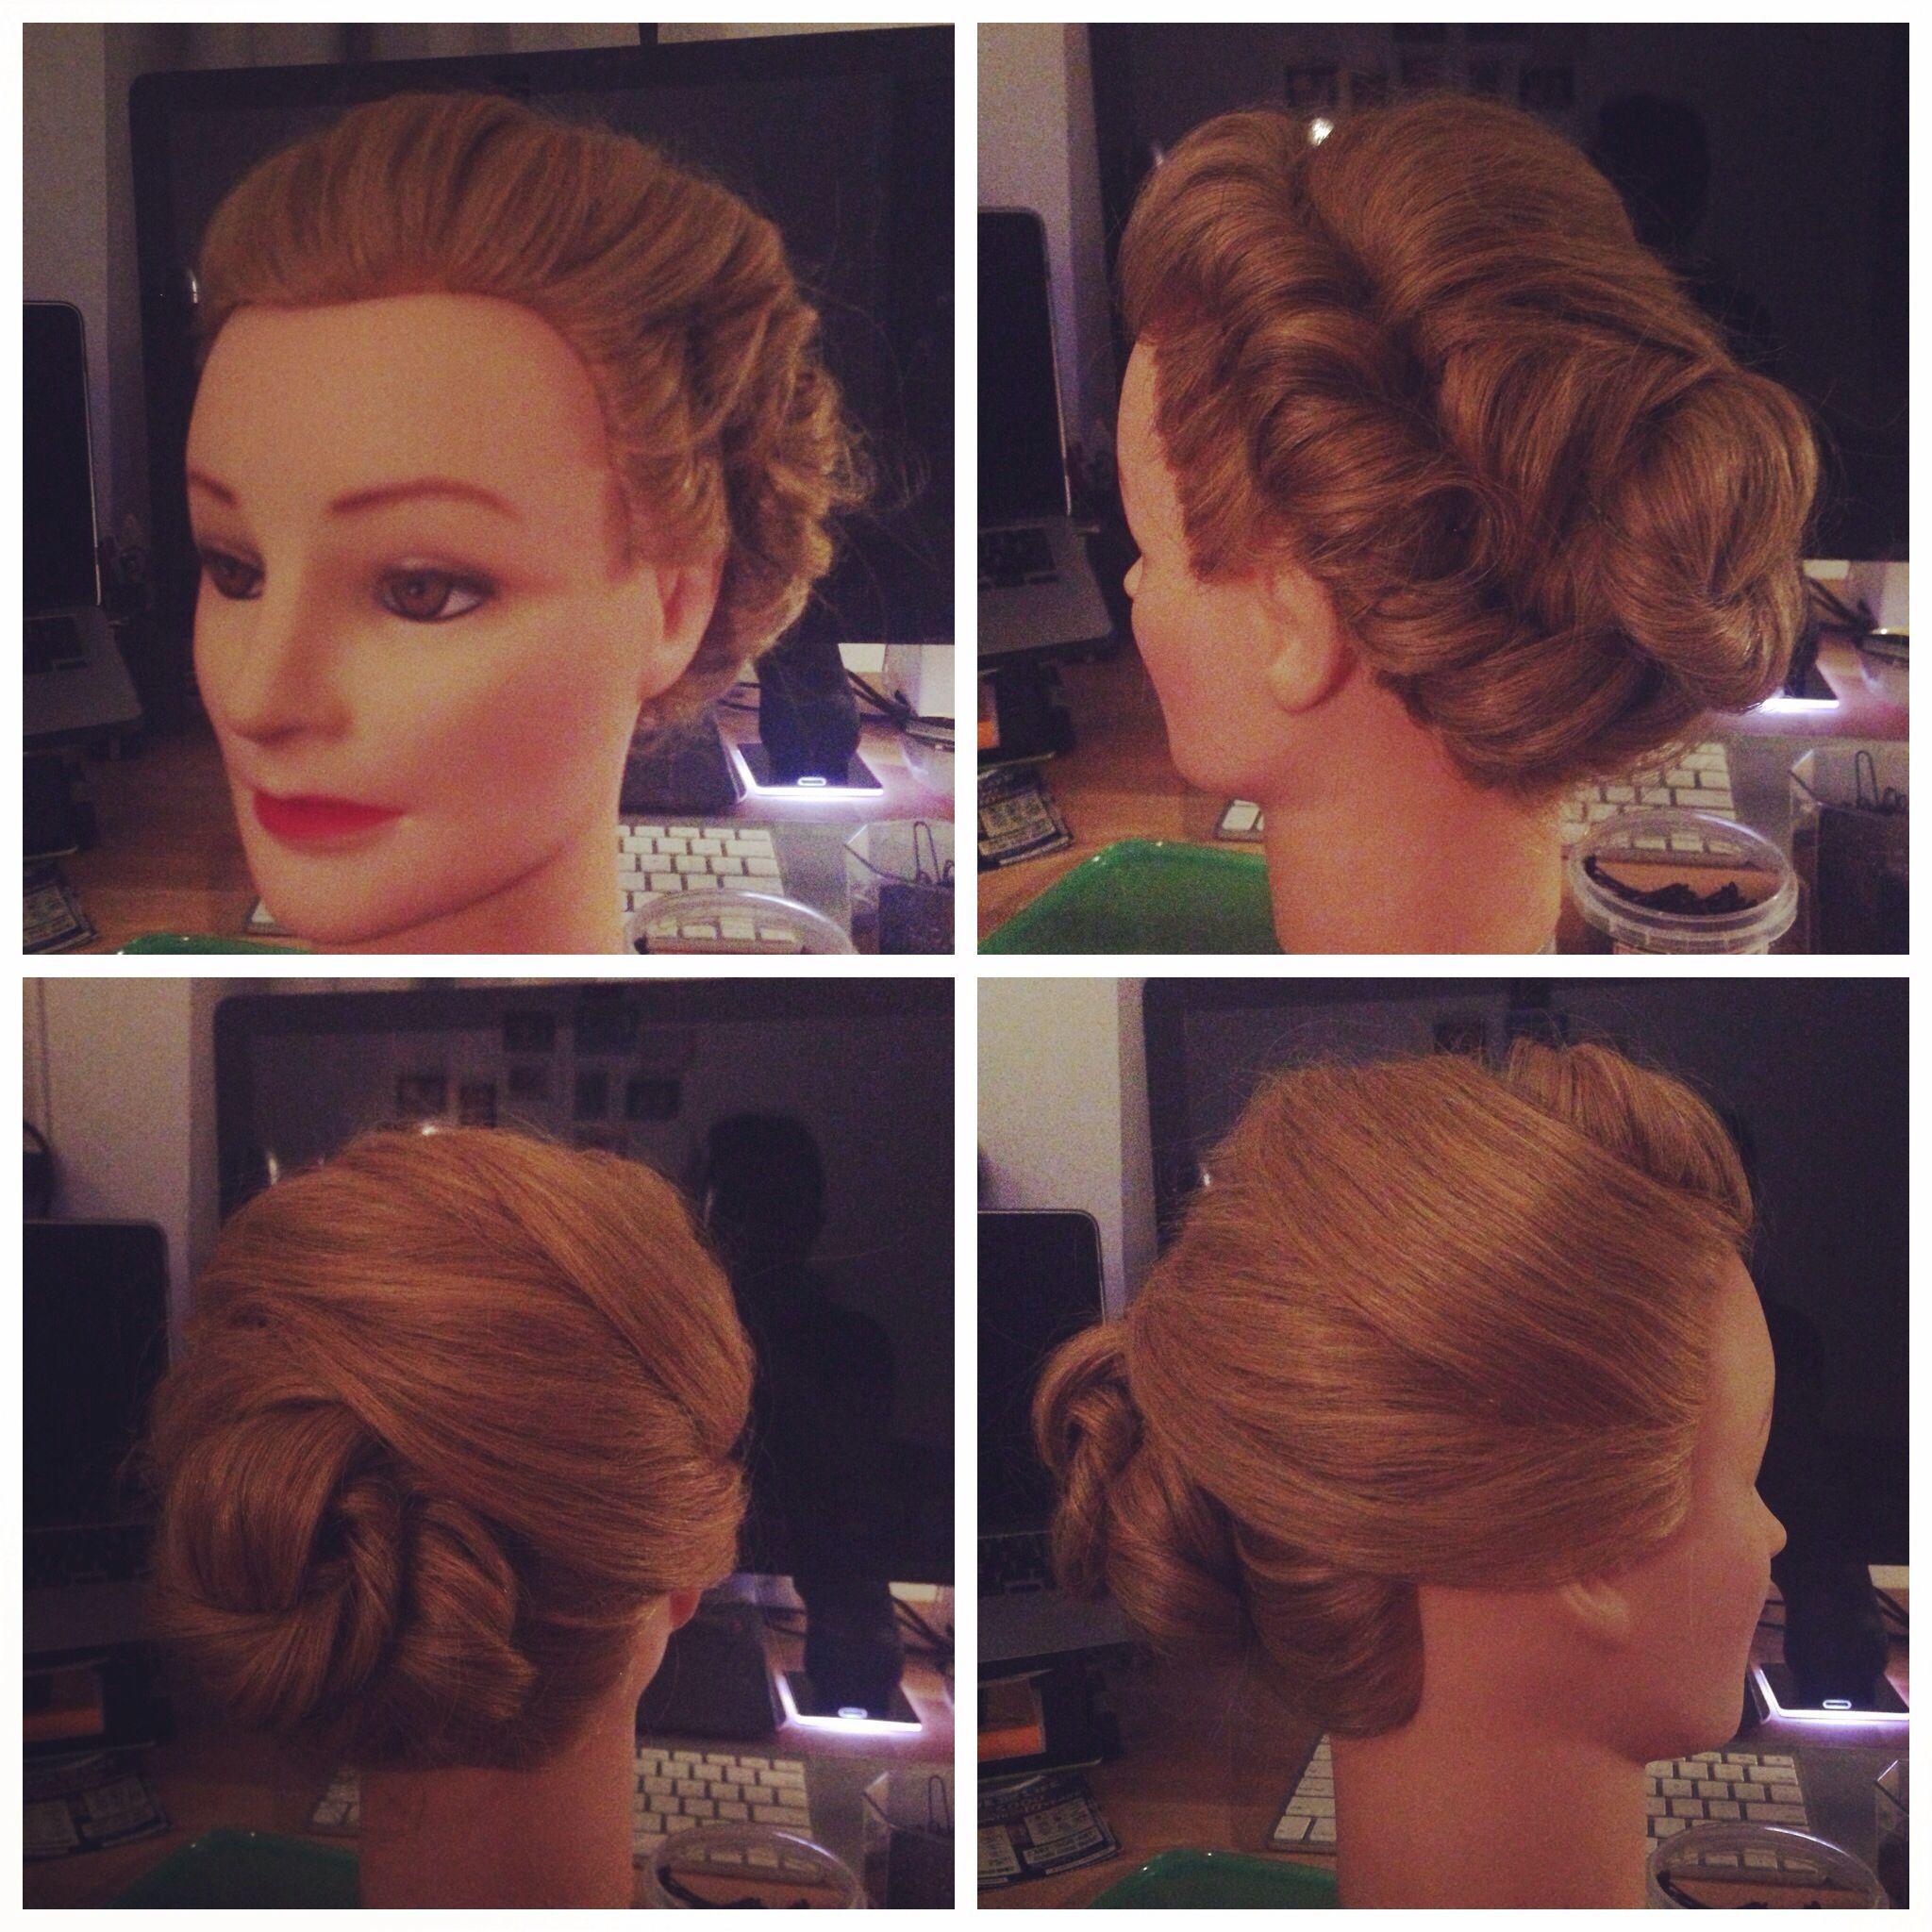 Elsa coronation hair updo from Frozen